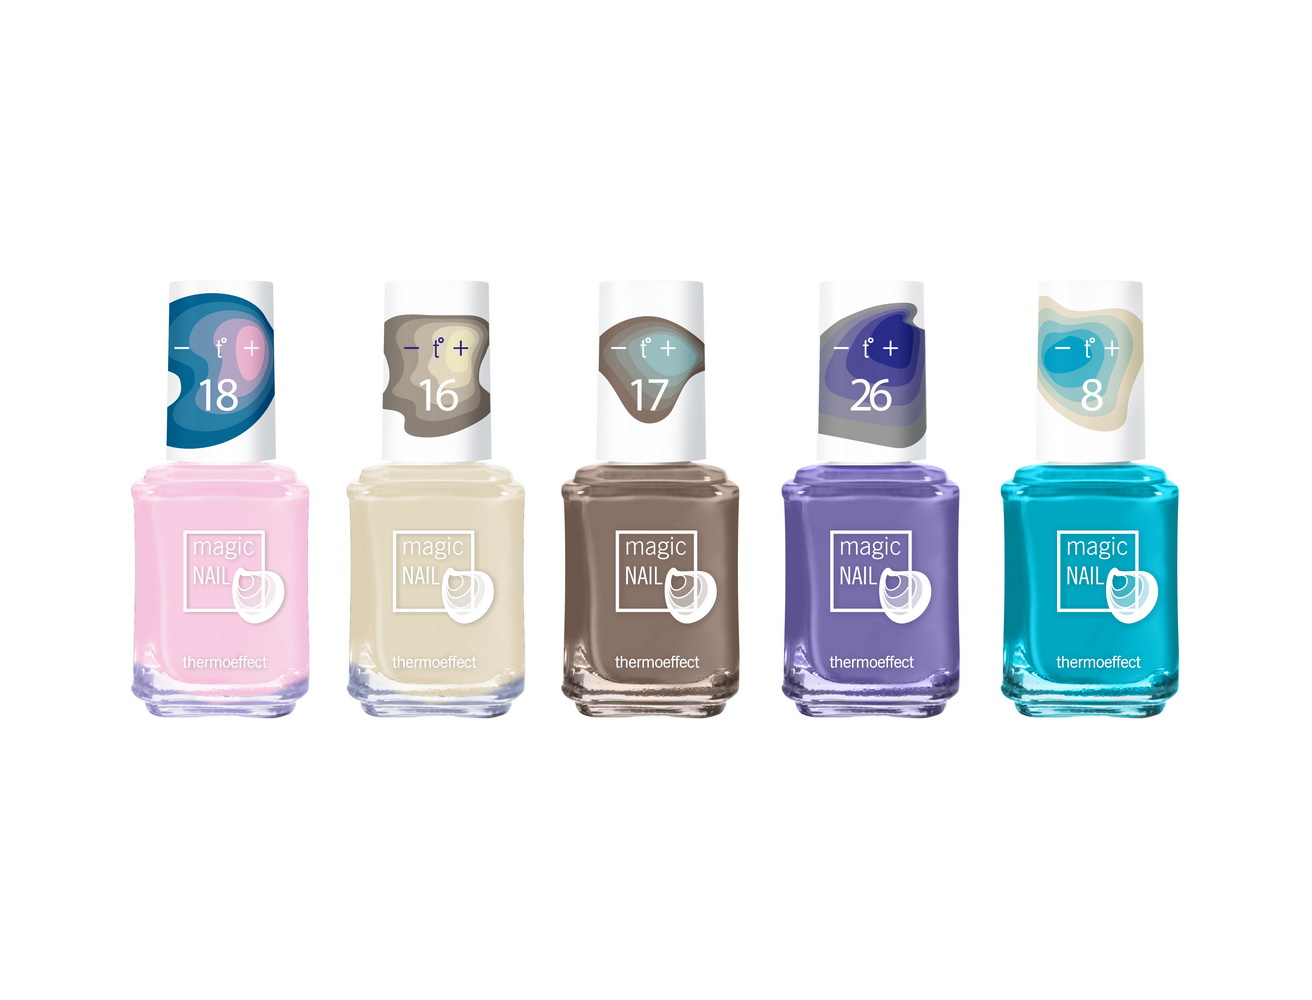 Дизайн этикетки лака для ногтей и логотип! фото f_9745a0ecc5963812.jpg